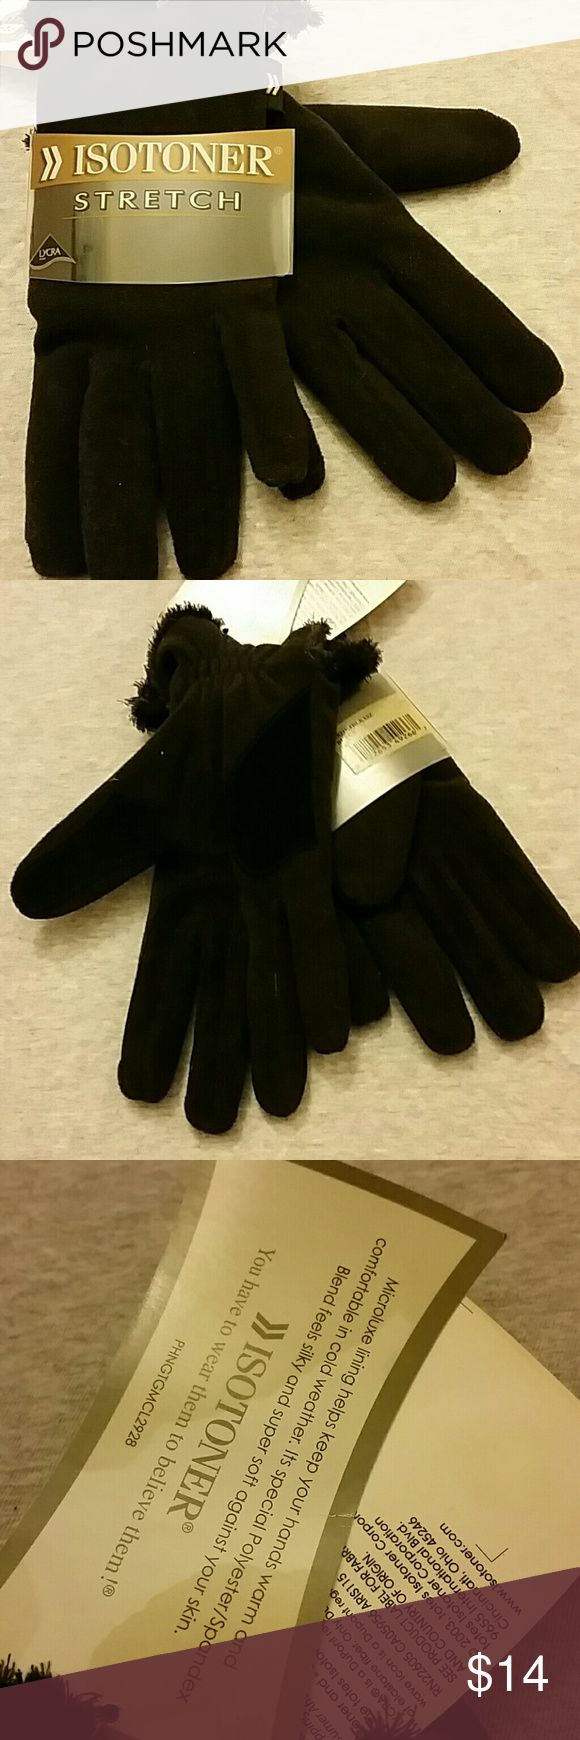 Fingerless gloves isotoner - Isotoner Fleece Gloves Bnwt Advanced Spandex With Lycra Blend Soft Warm Microfiber Fleece